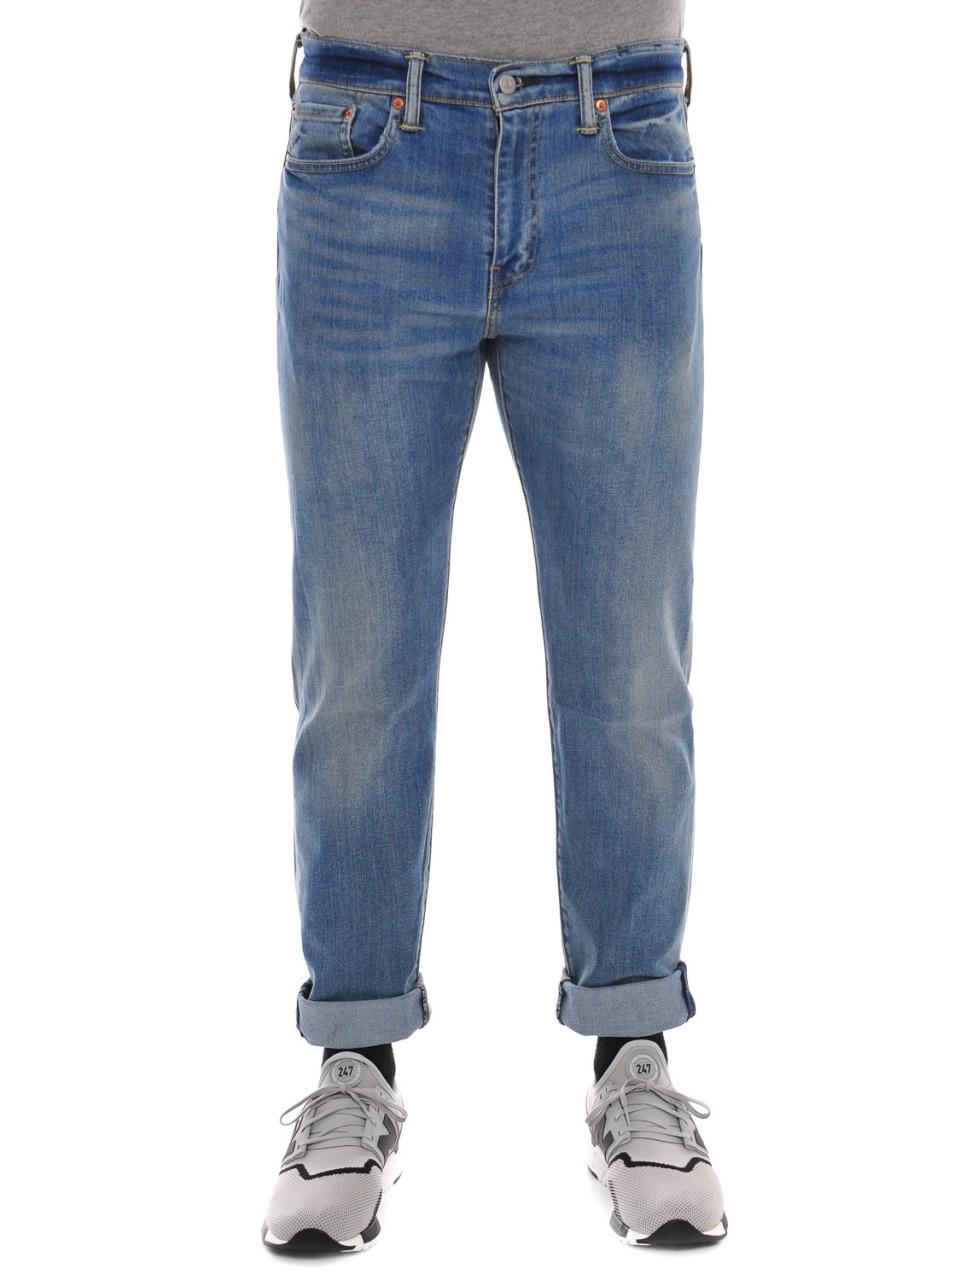 Levi's Uomo Jeans Levi's 502 Uomo Dennis Regular Taper 5070045G